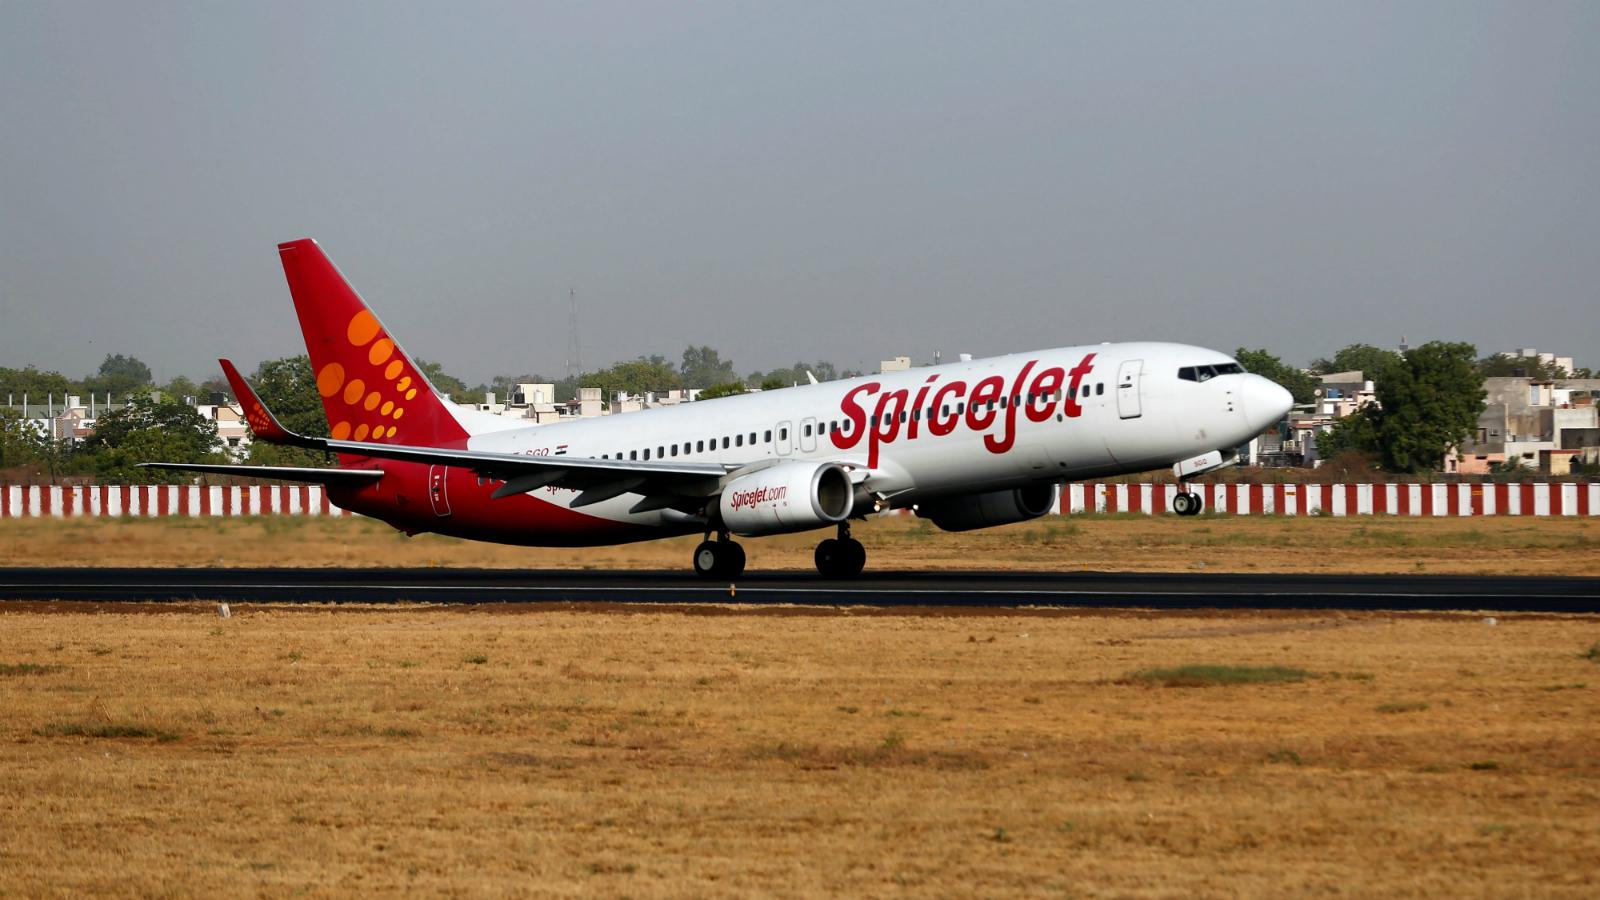 India-SpiceJet-IndiGo-Airline-Narendra Modi-Air India